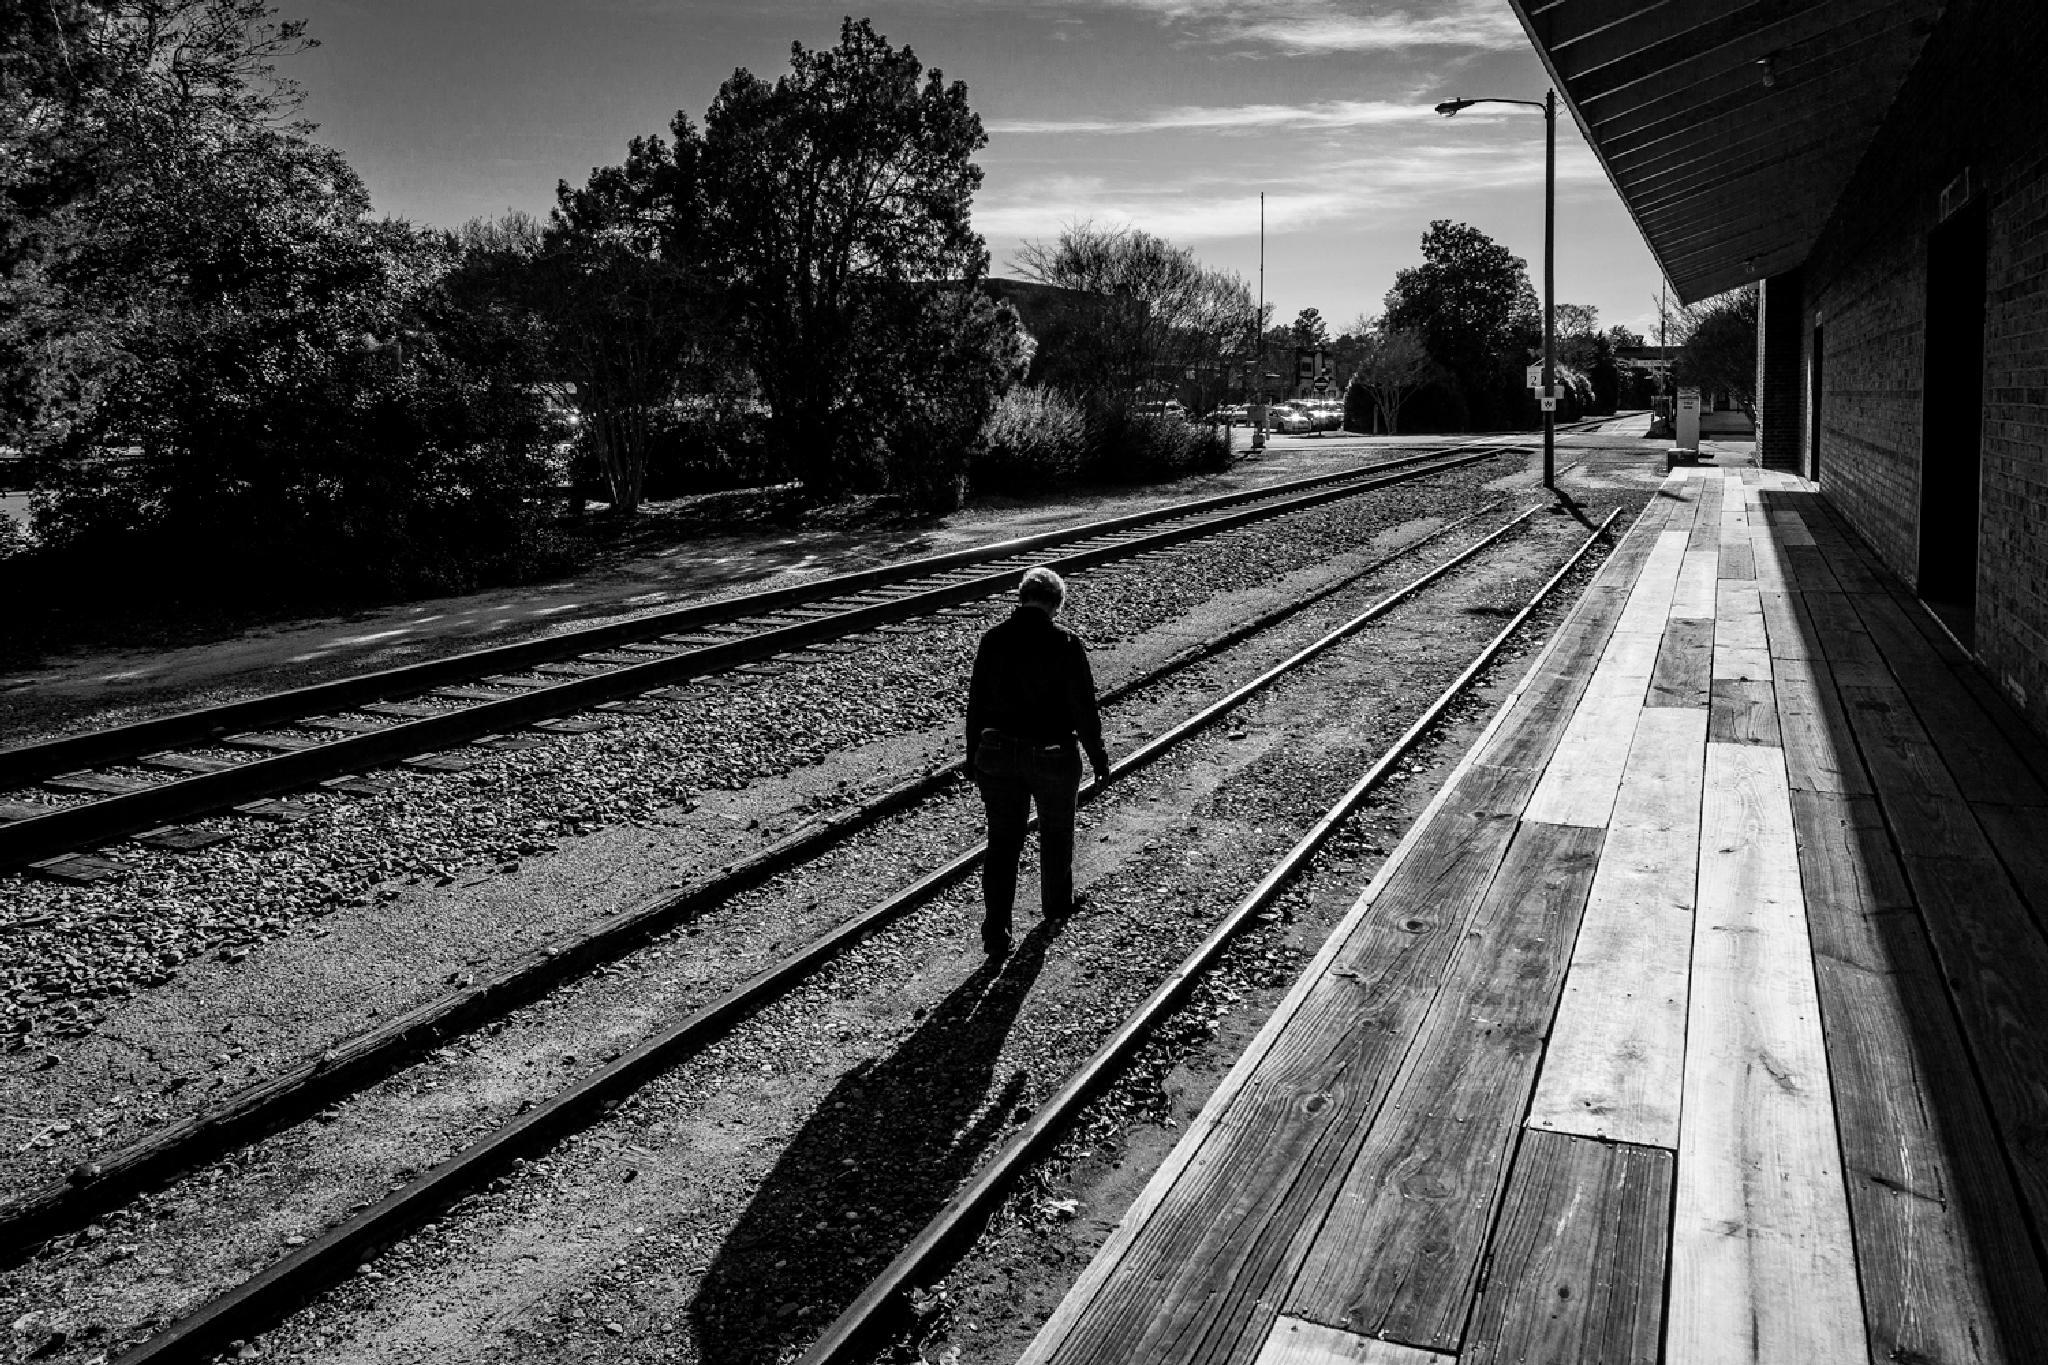 Walkin the Rails by NaturesVeiwsPhotography